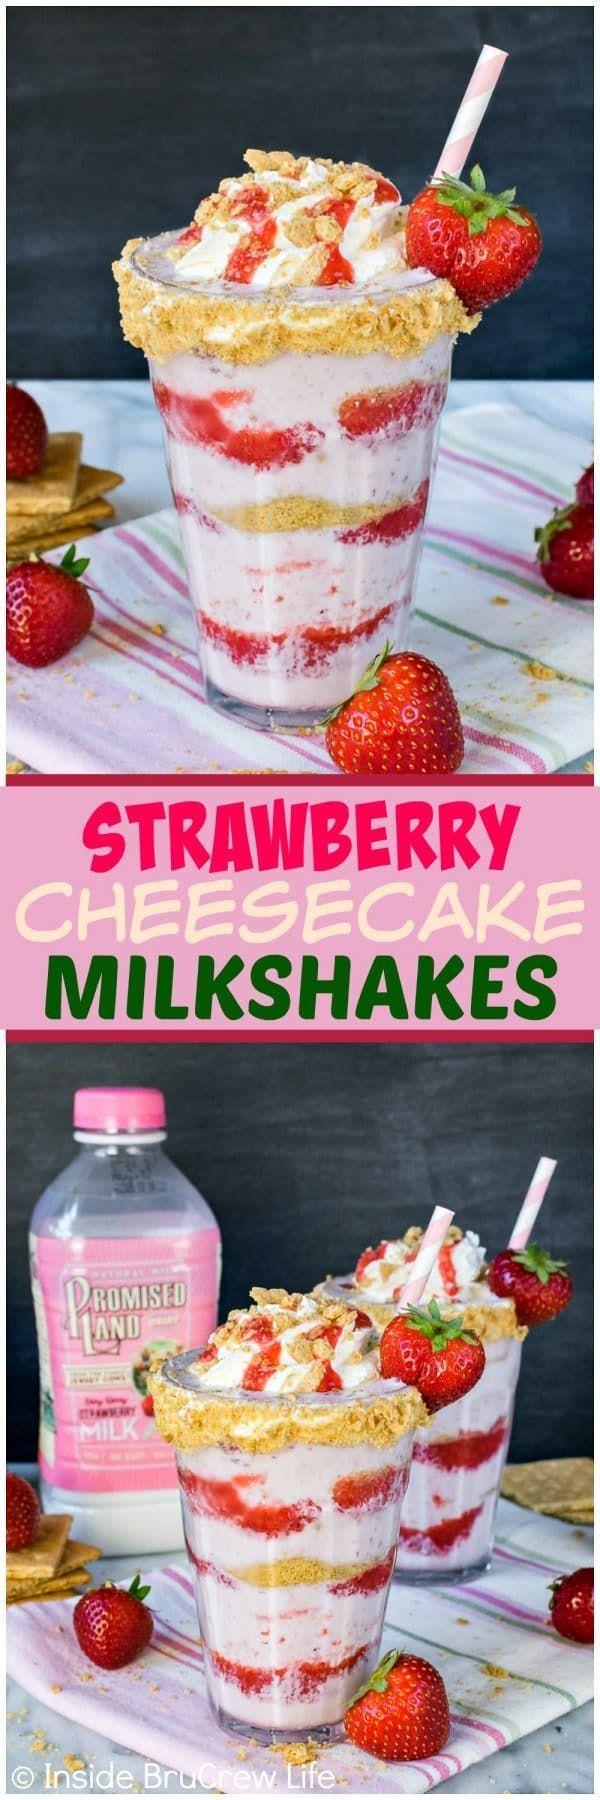 Strawberry Cheesecake Milkshakes - layers of strawberry sauce, milkshake, and graham cracker crumbs makes one amazing frozen drink. Great summer drink recipe!